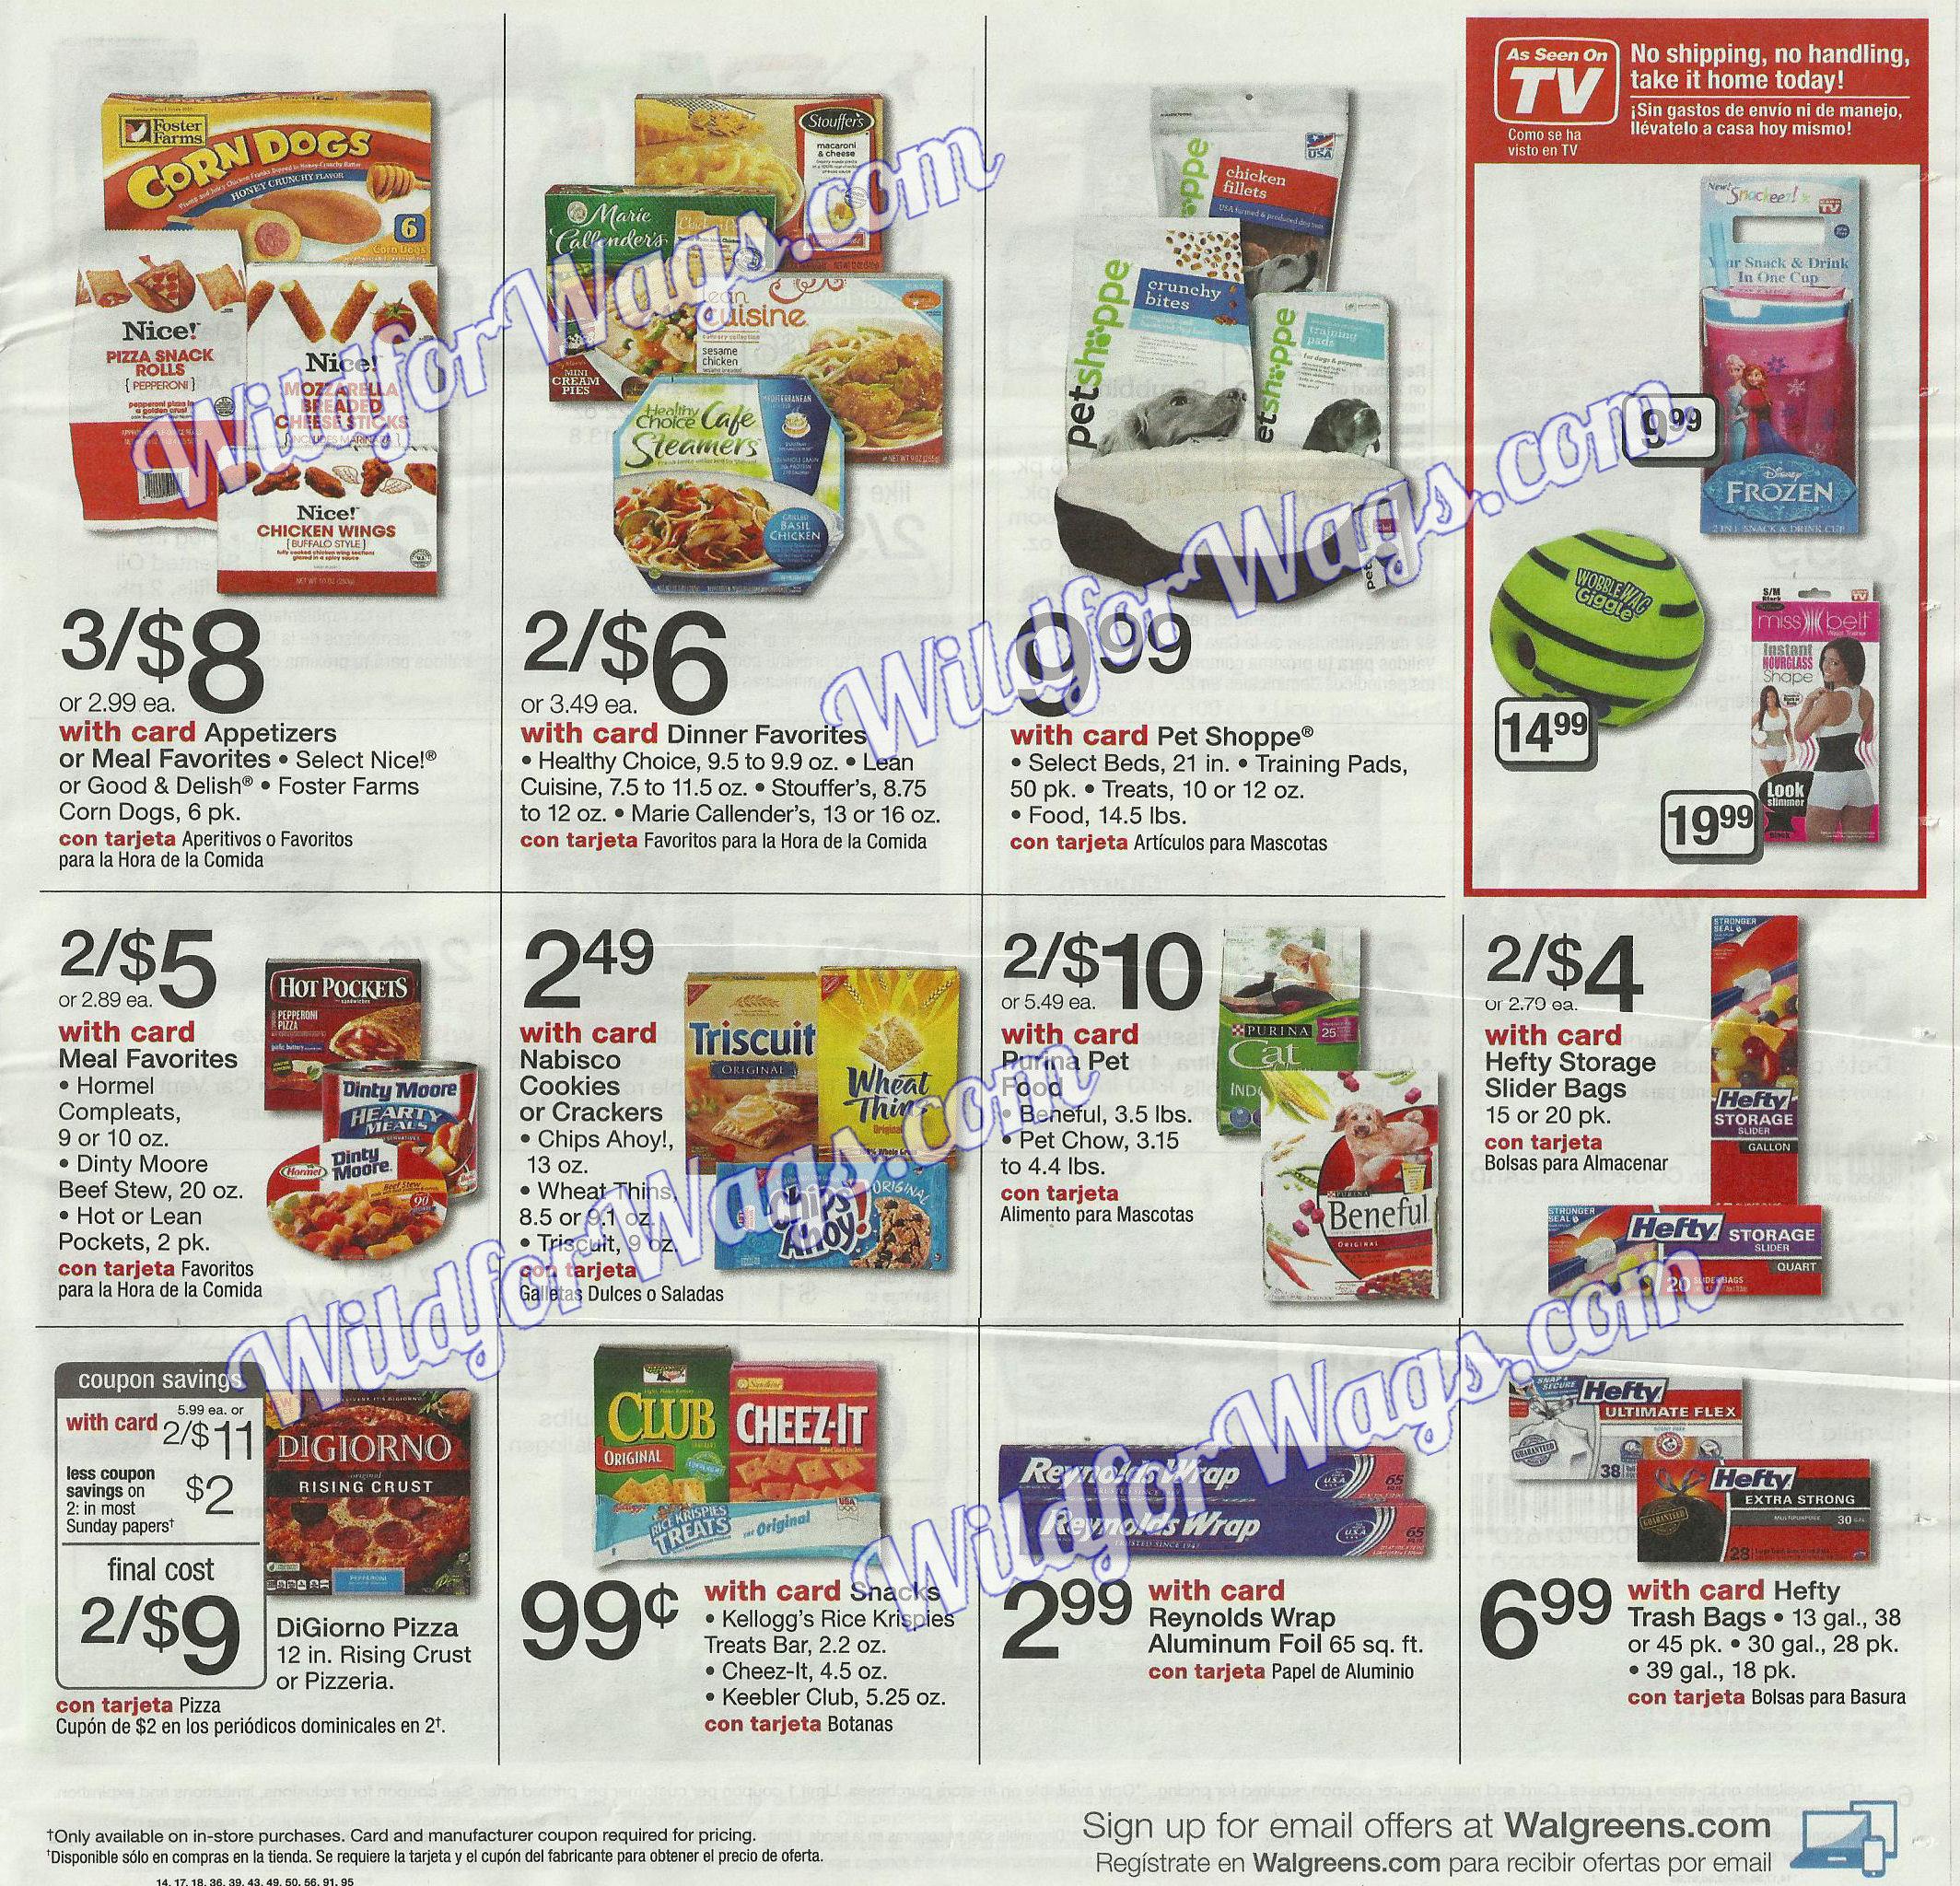 Coupons Balance Points Rewards Walgreens